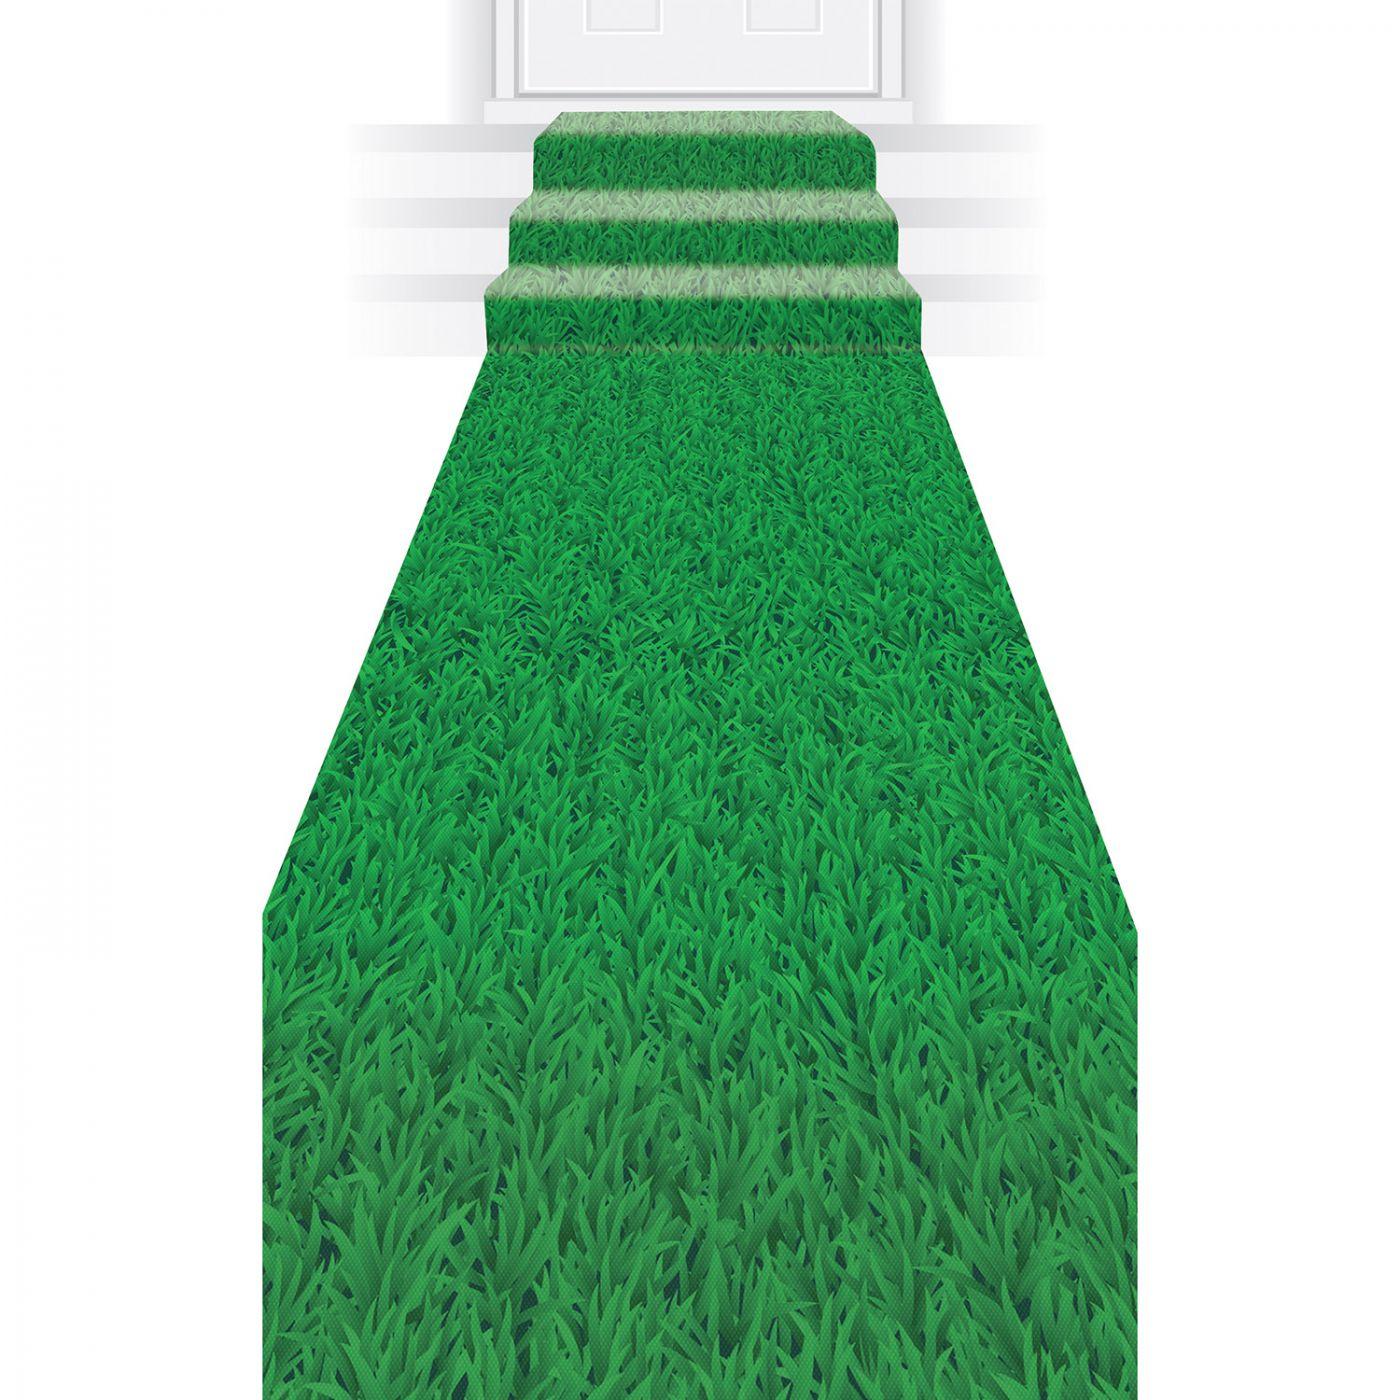 Grass Runner (6) image